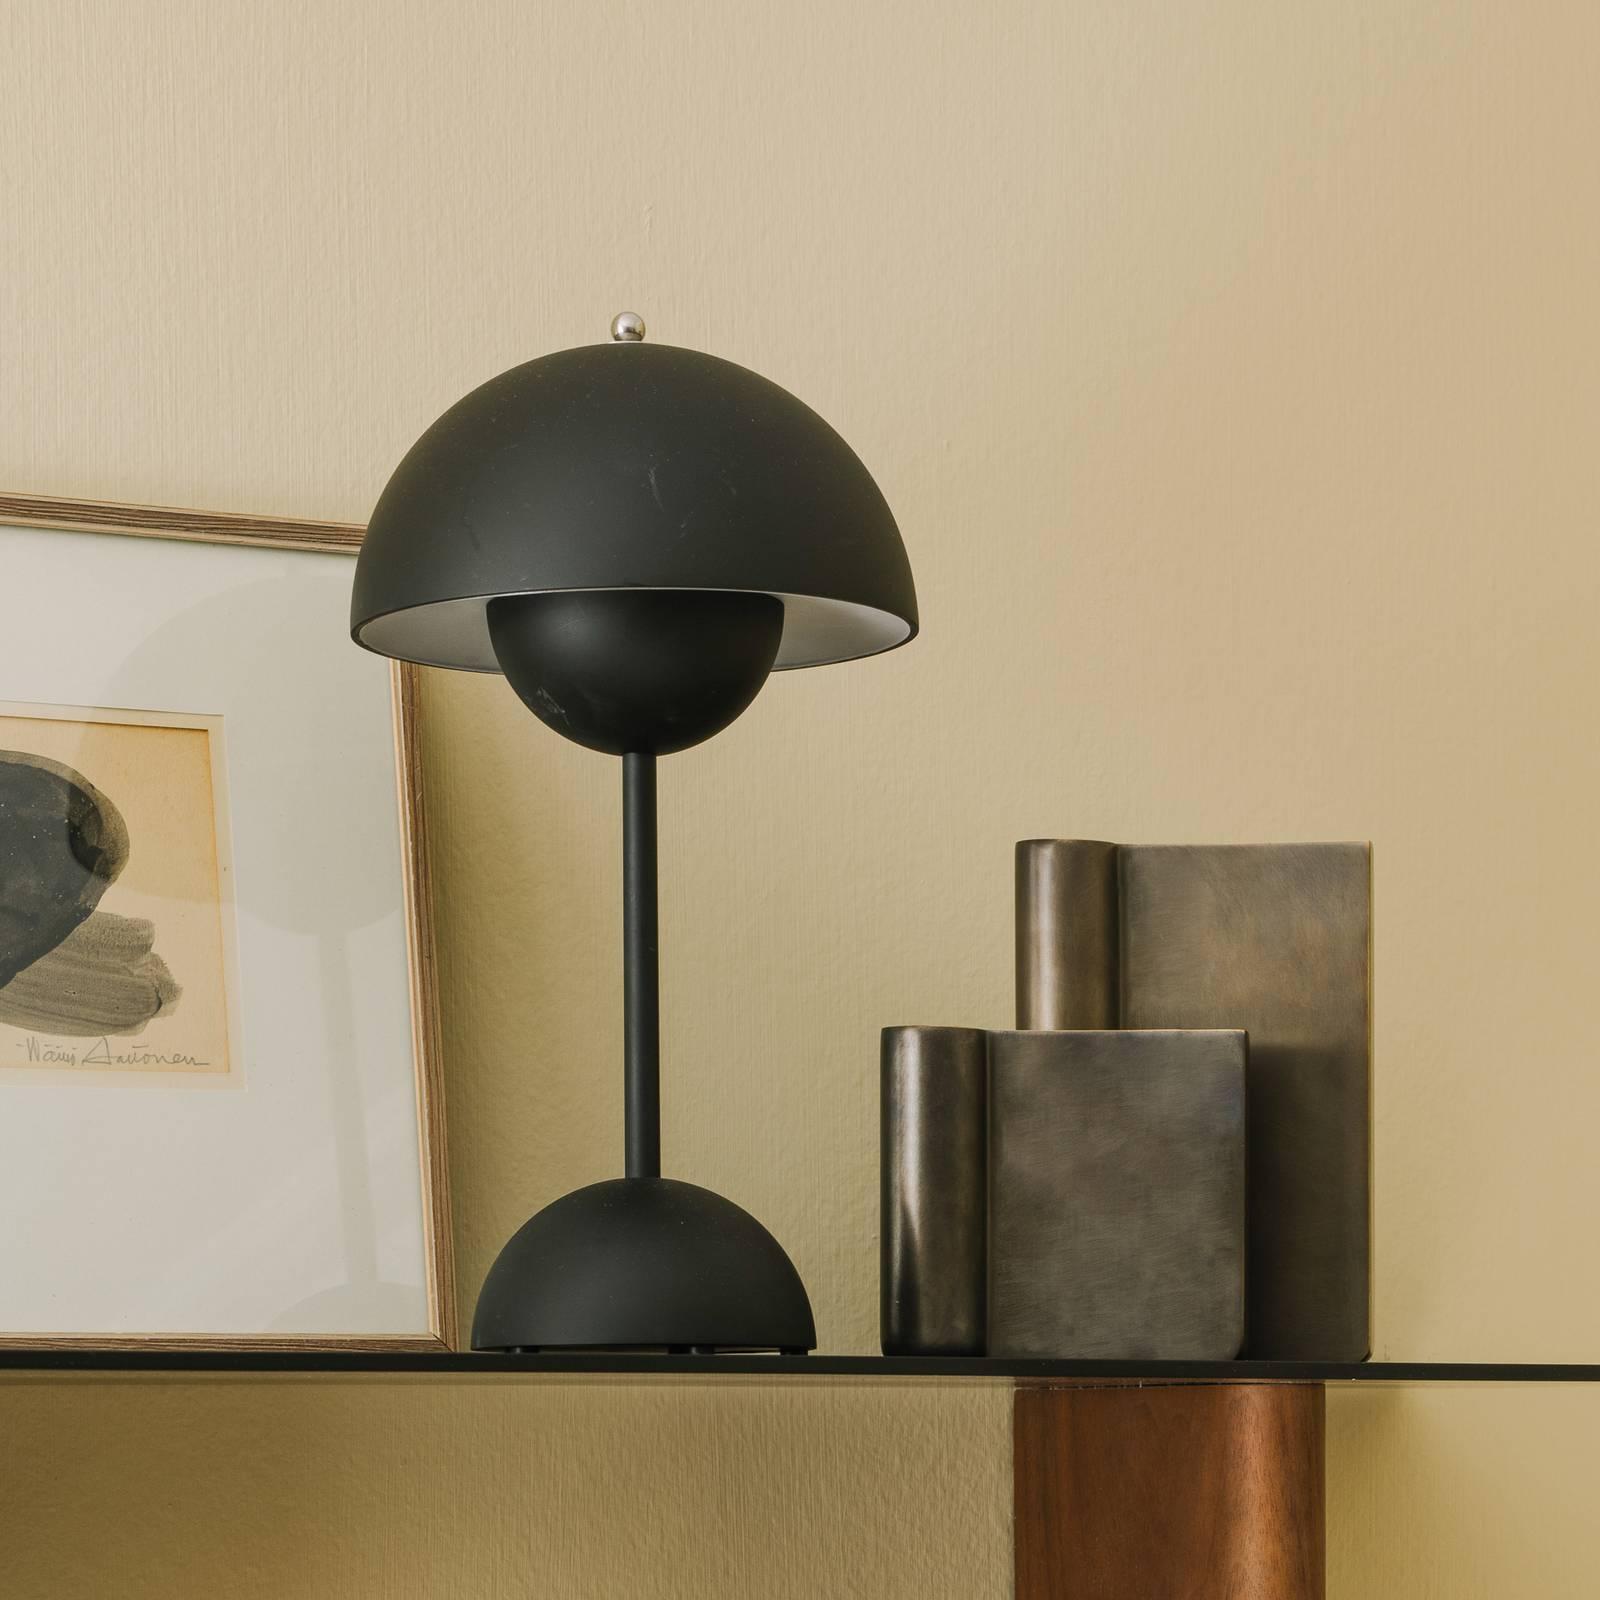 &Tradition Flowerpot VP9 -pöytälamppu, mattamusta